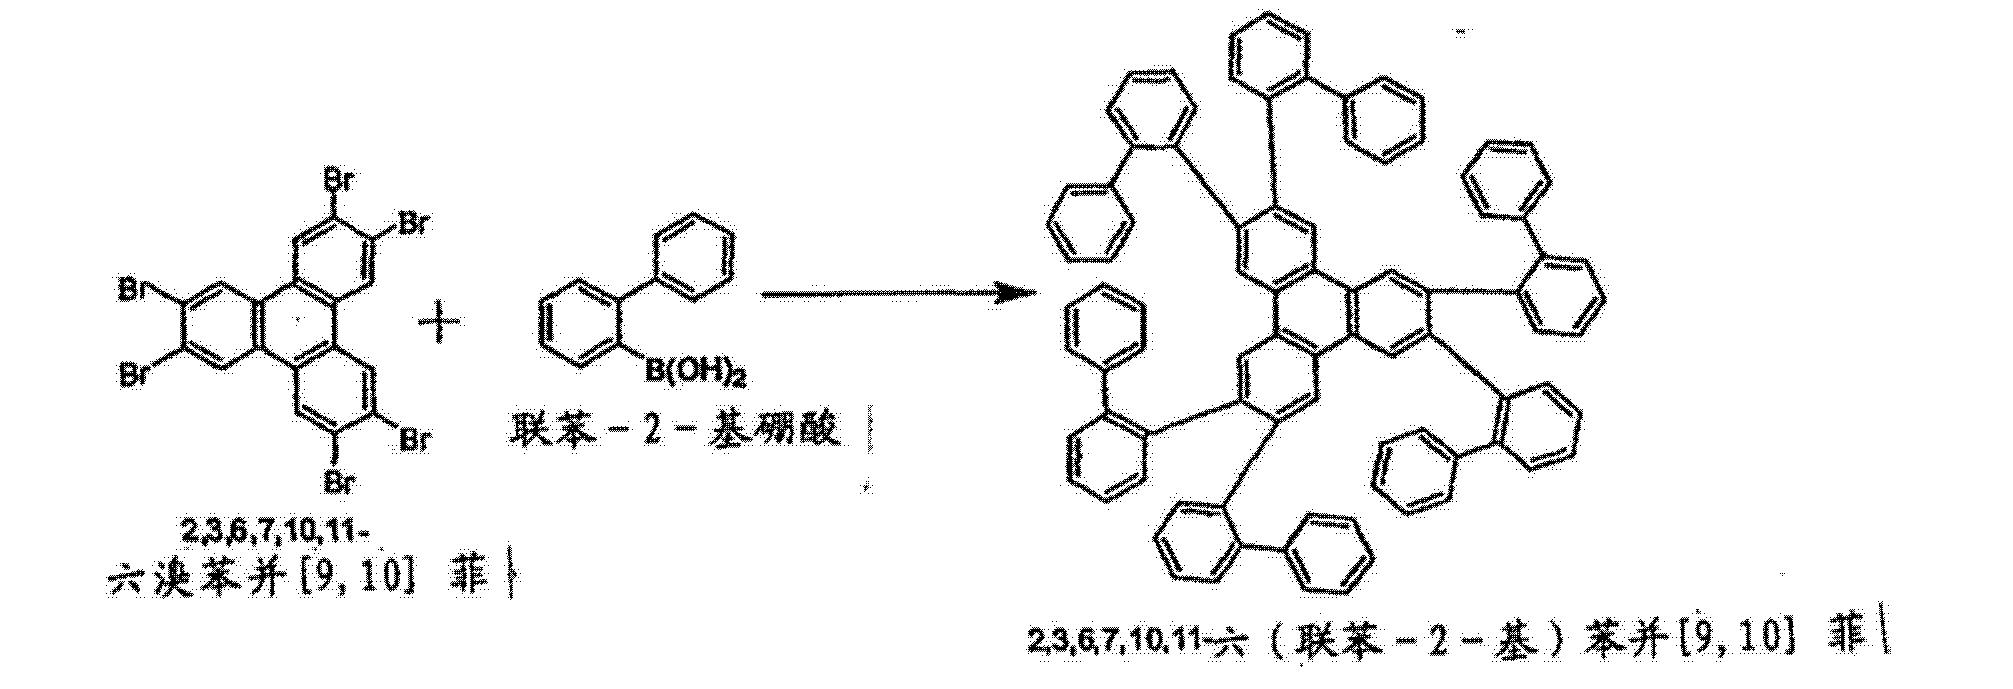 Figure CN103746080AD00291